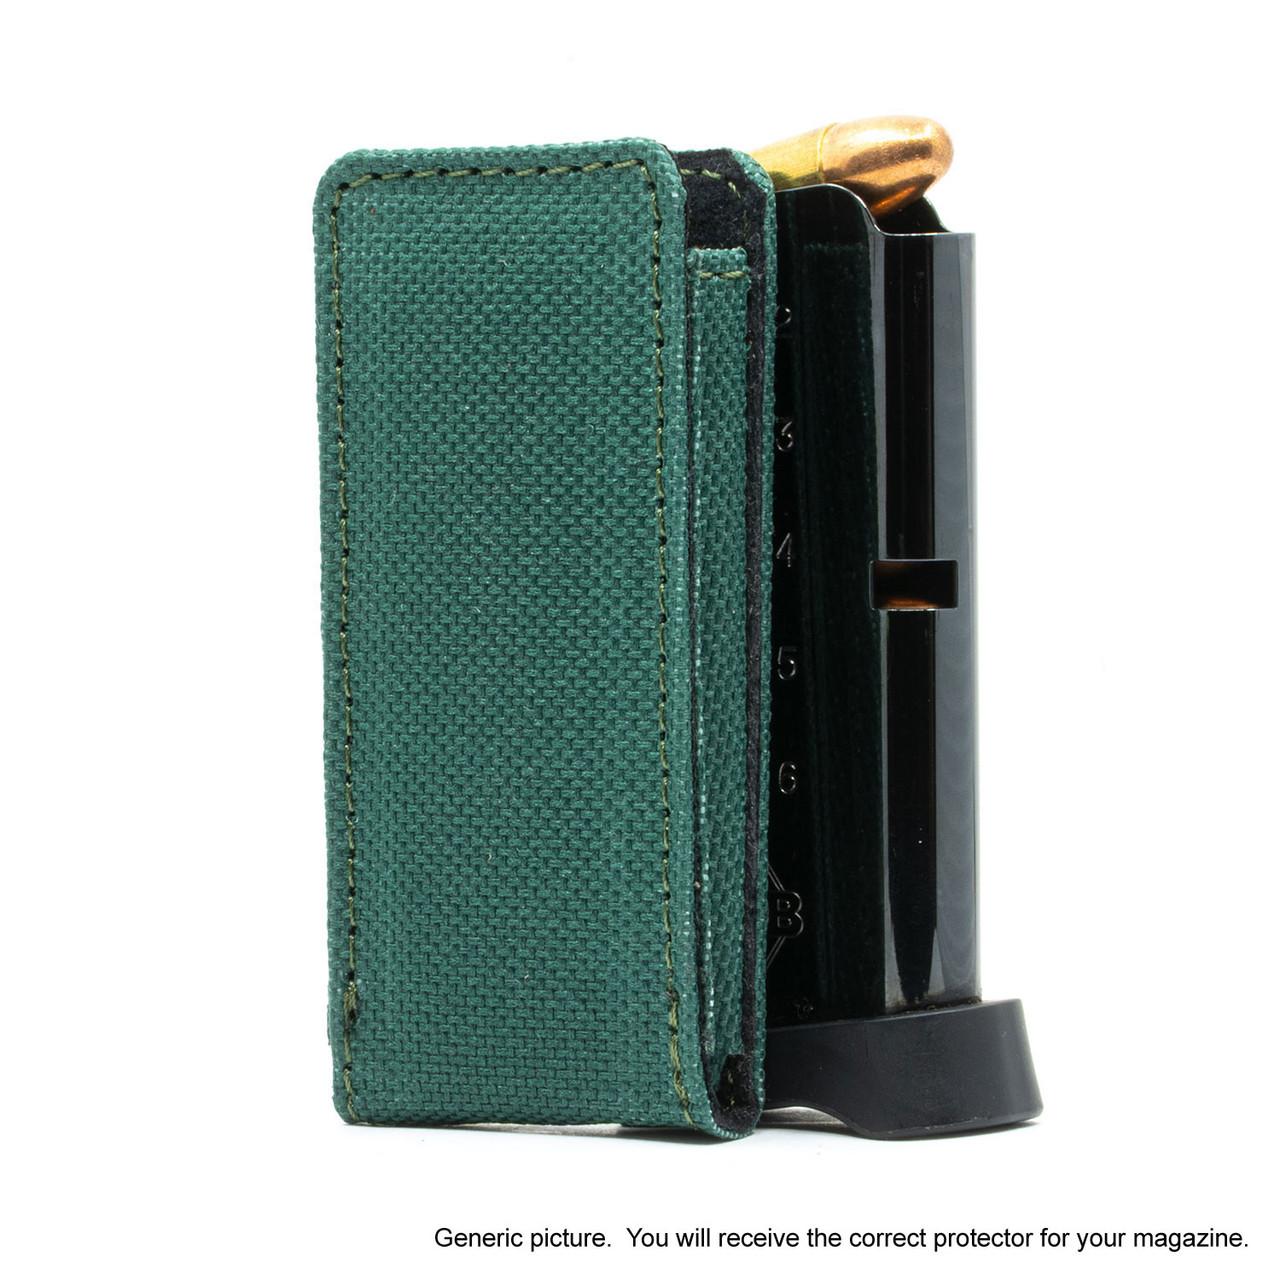 Beretta 84fs Cheetah Green Covert Magazine Pocket Protector